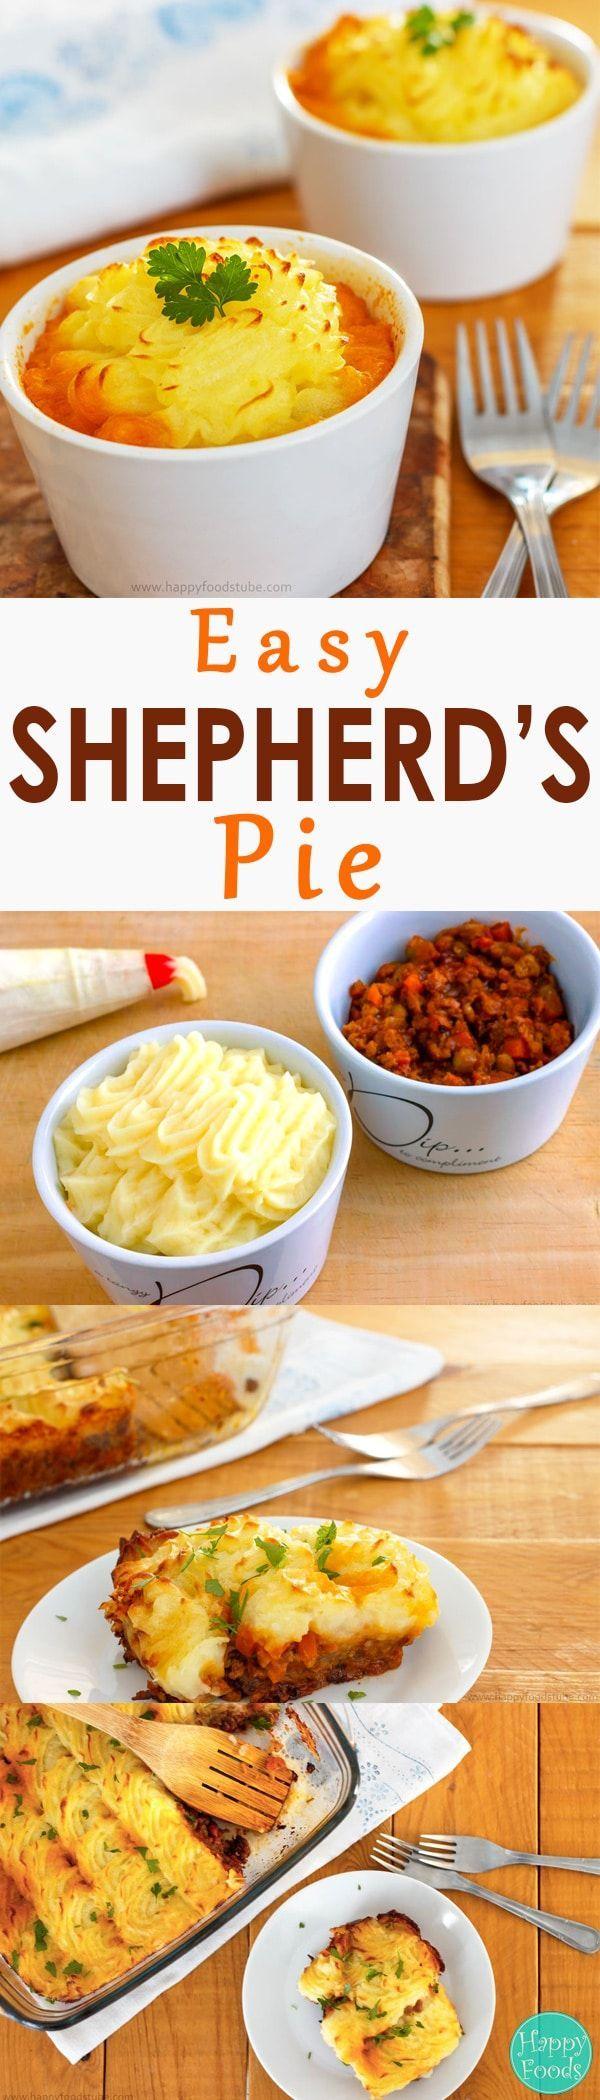 Easy Shepherd's Pie Recipe Recipes, Food, Comfort food